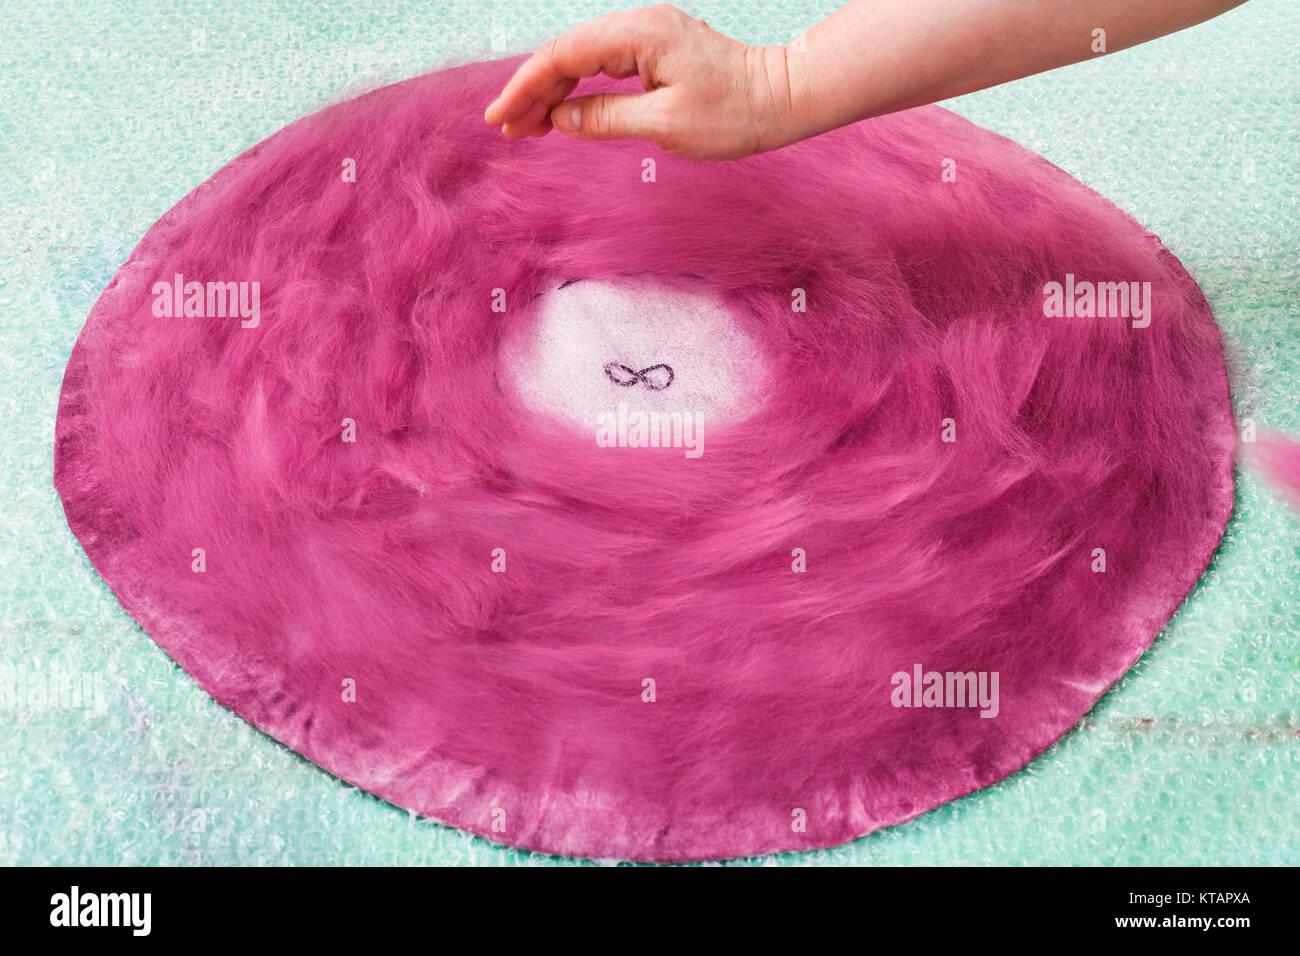 arraging wool fibers on back side of hat layout - Stock Image